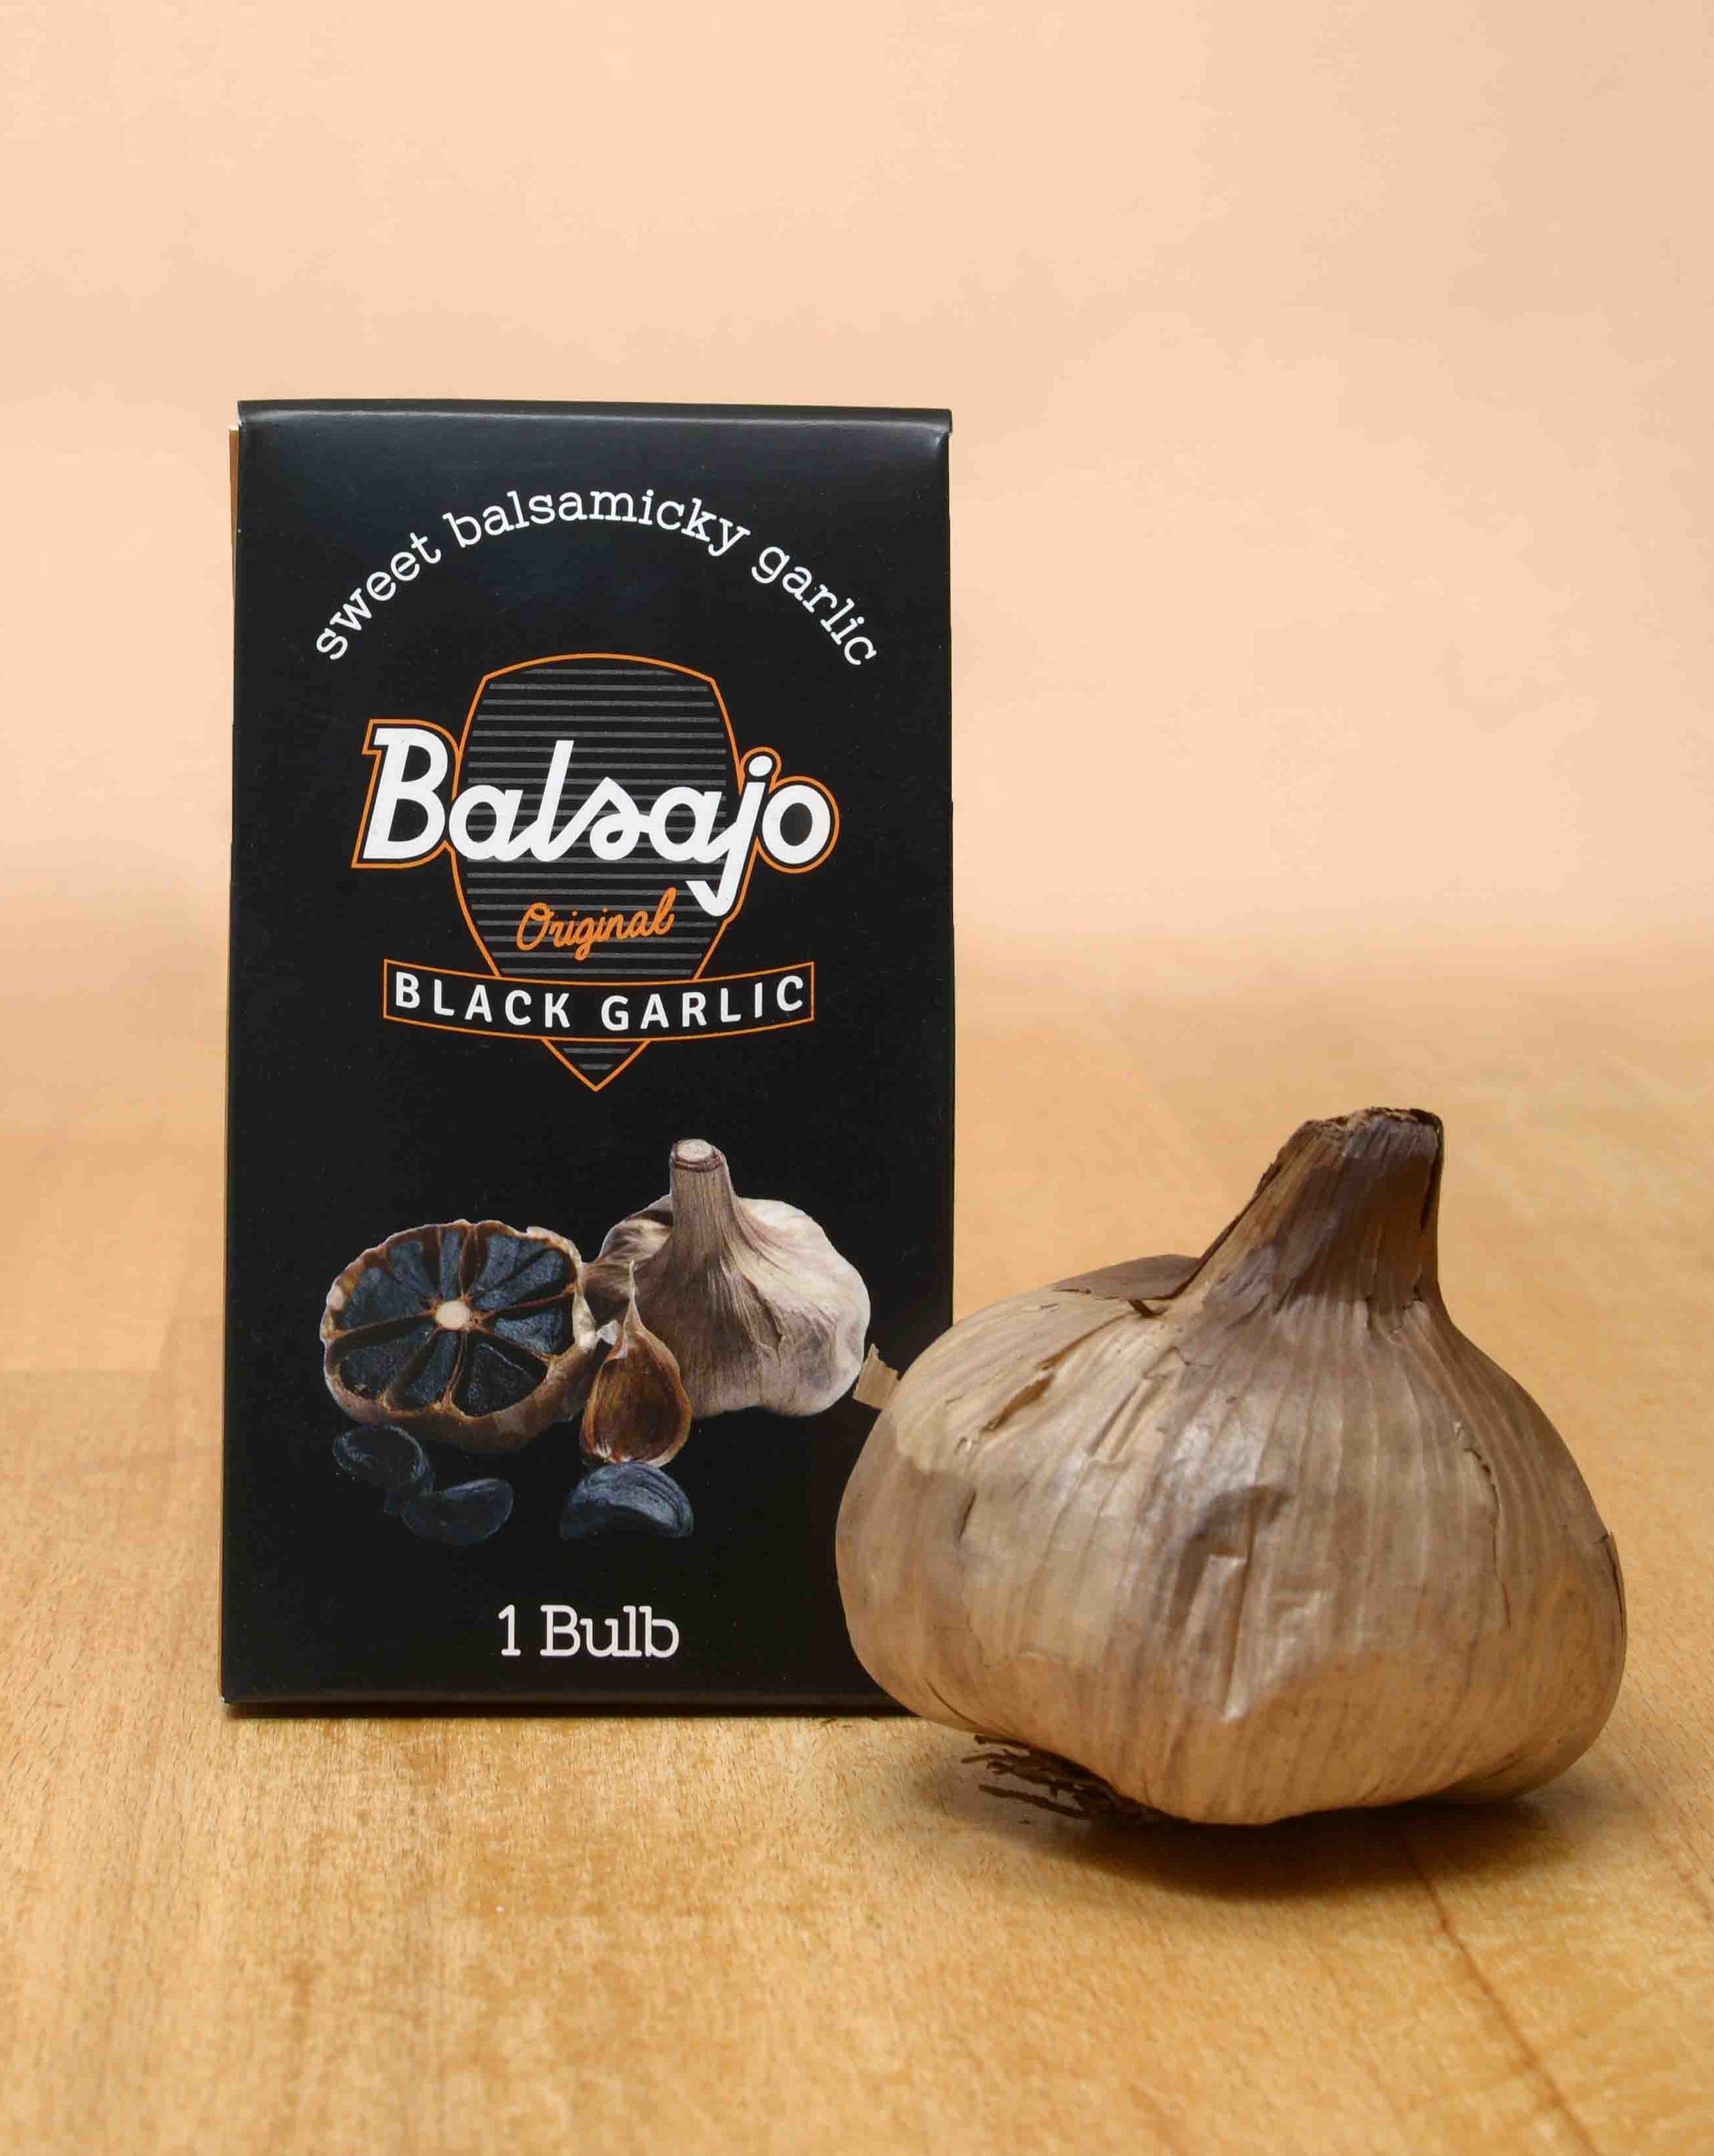 Balsajo Black Garlic bulb